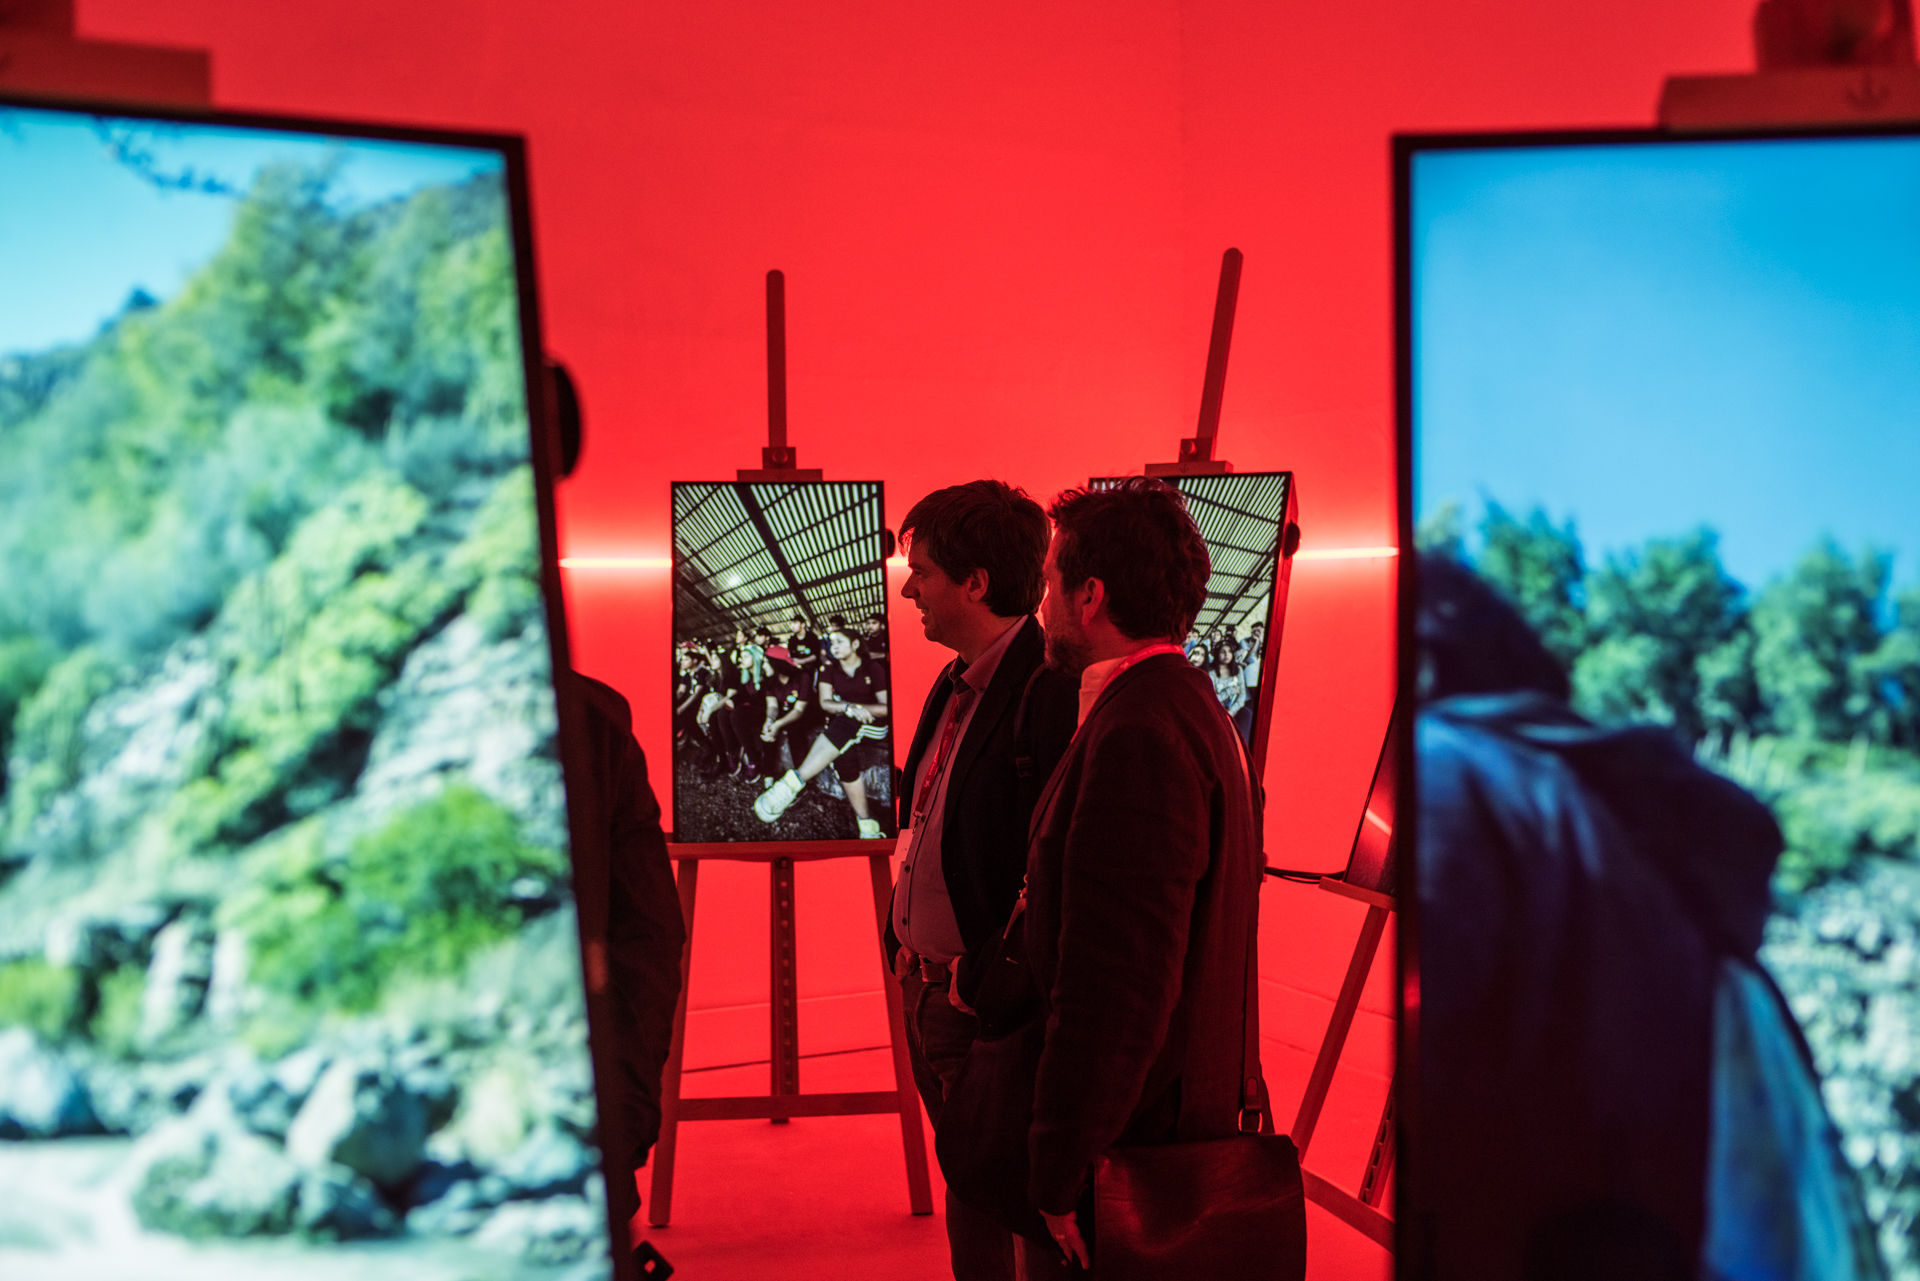 ANDES SHADOW La Biennale di Venezia 2016 © Gonzalo Puga-7417